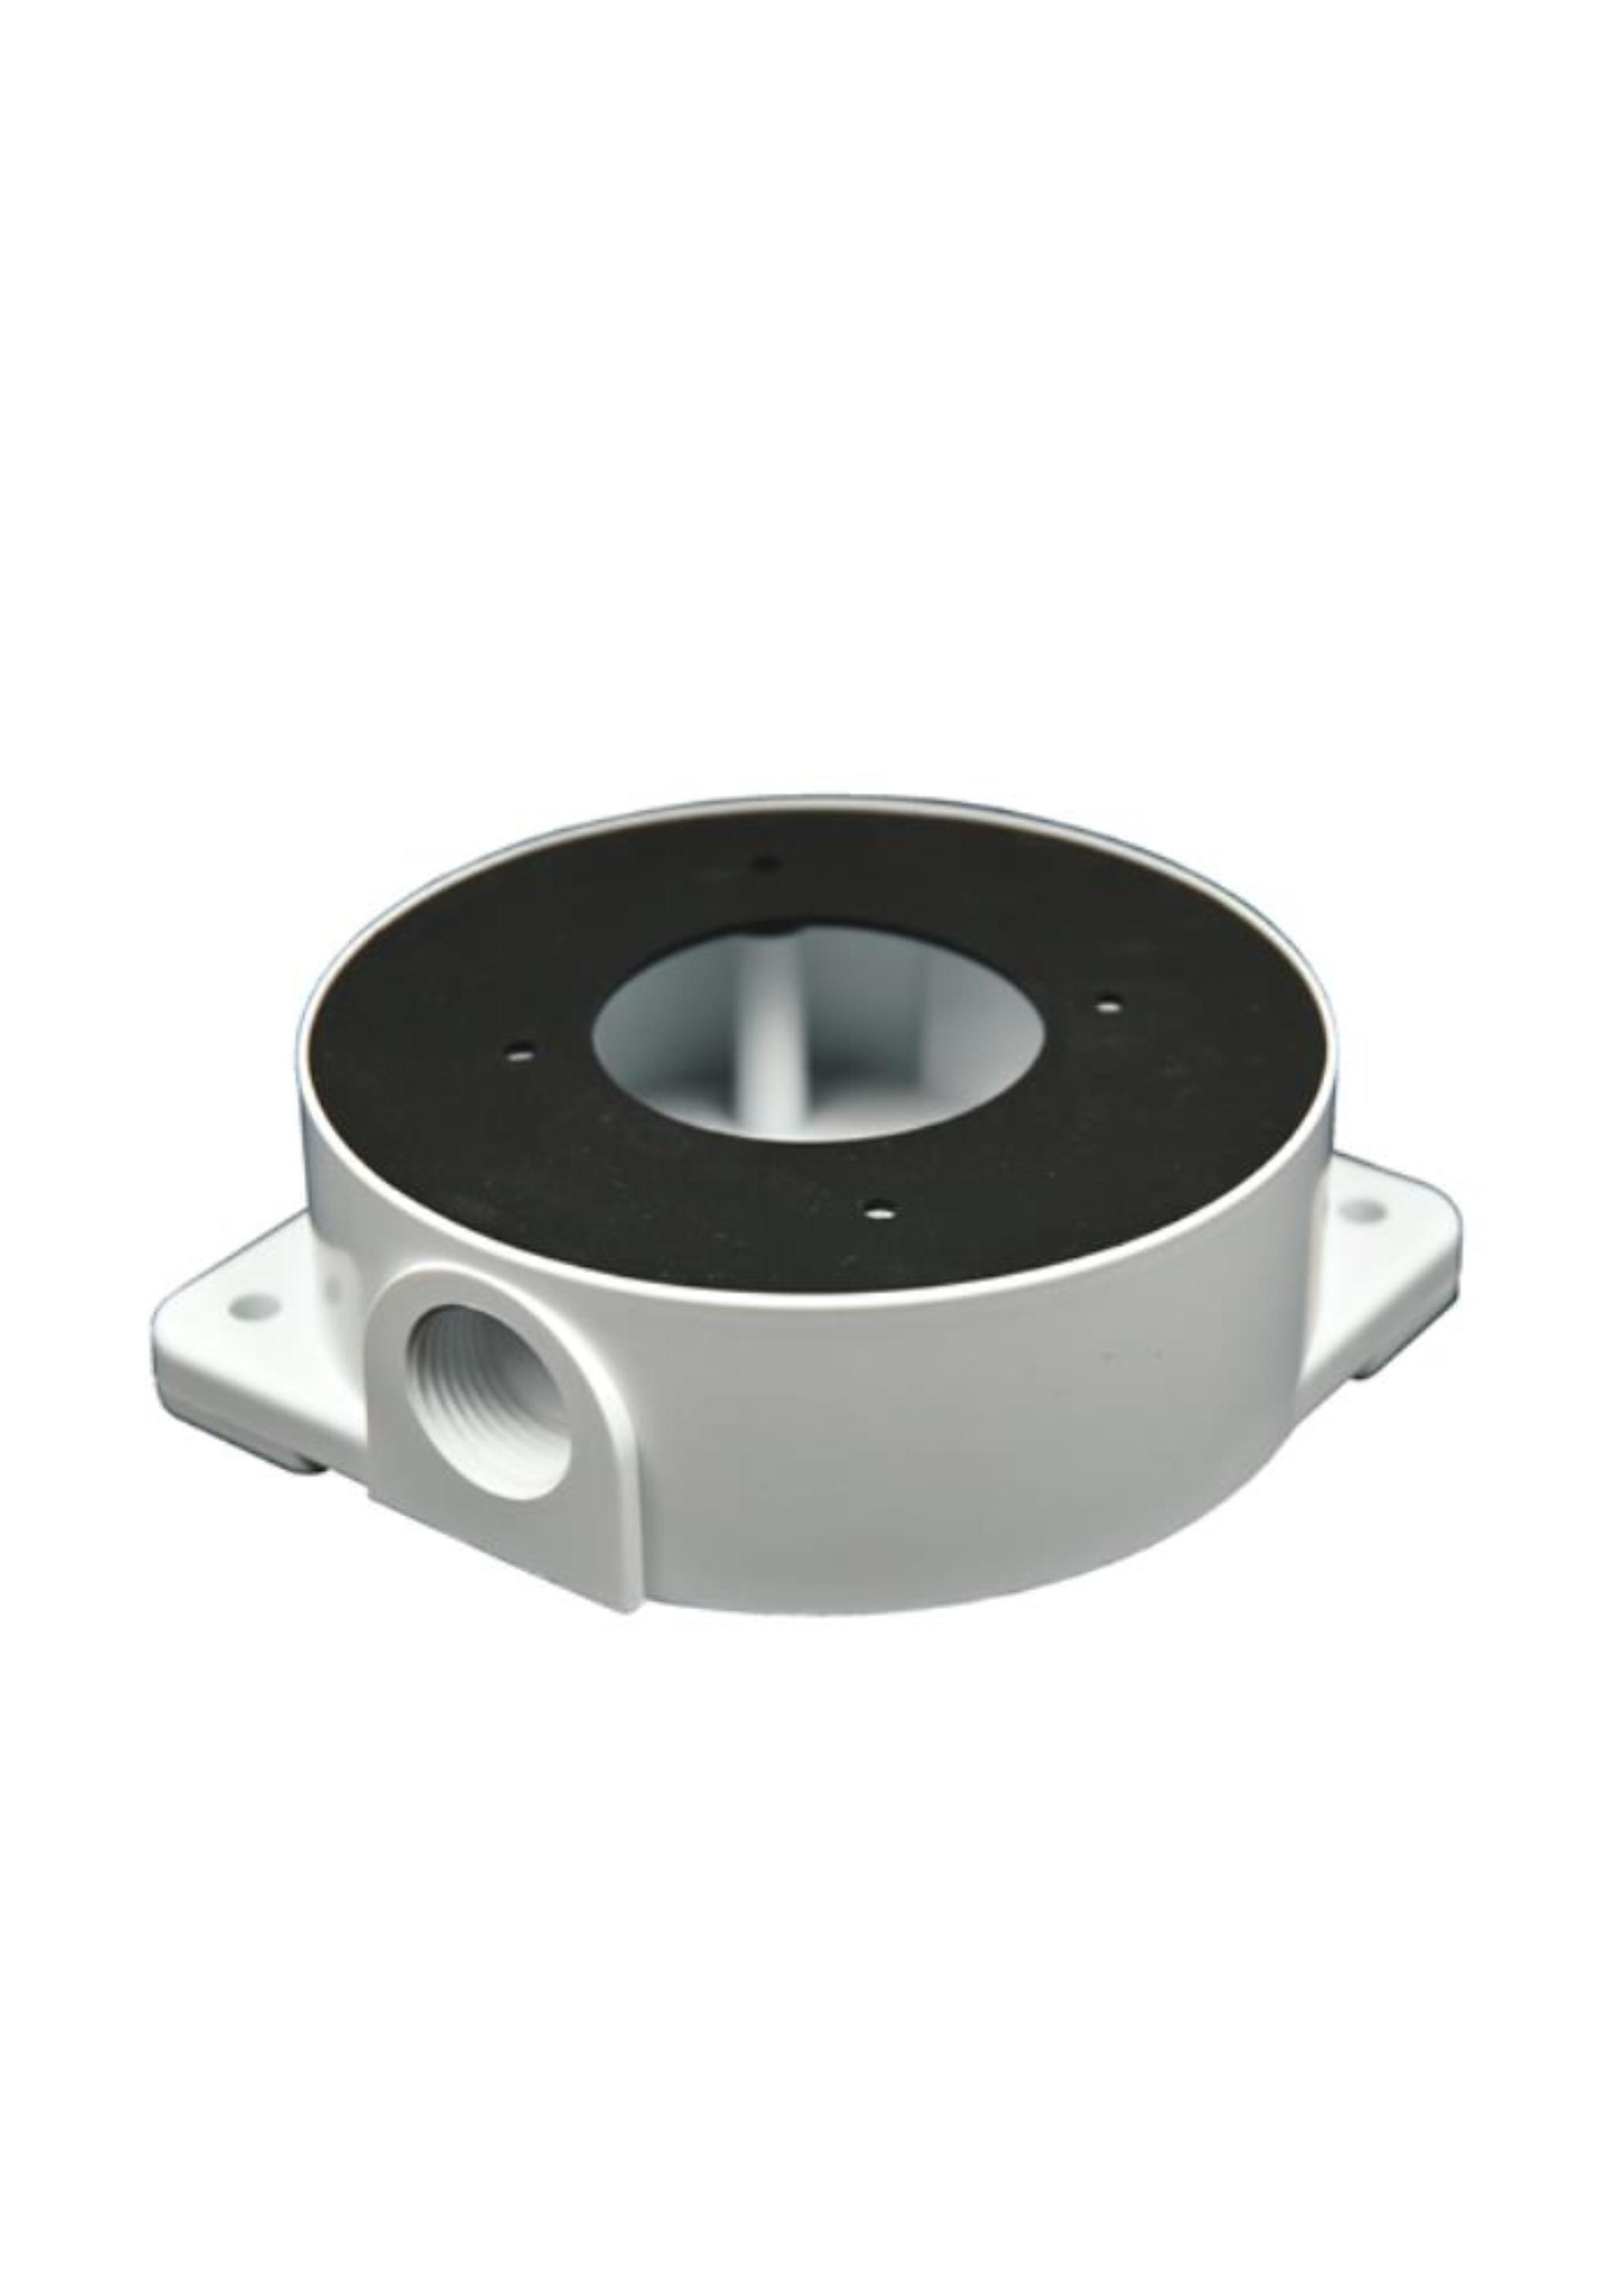 Sounder Weatherproofing Kit (white) 1670890-20